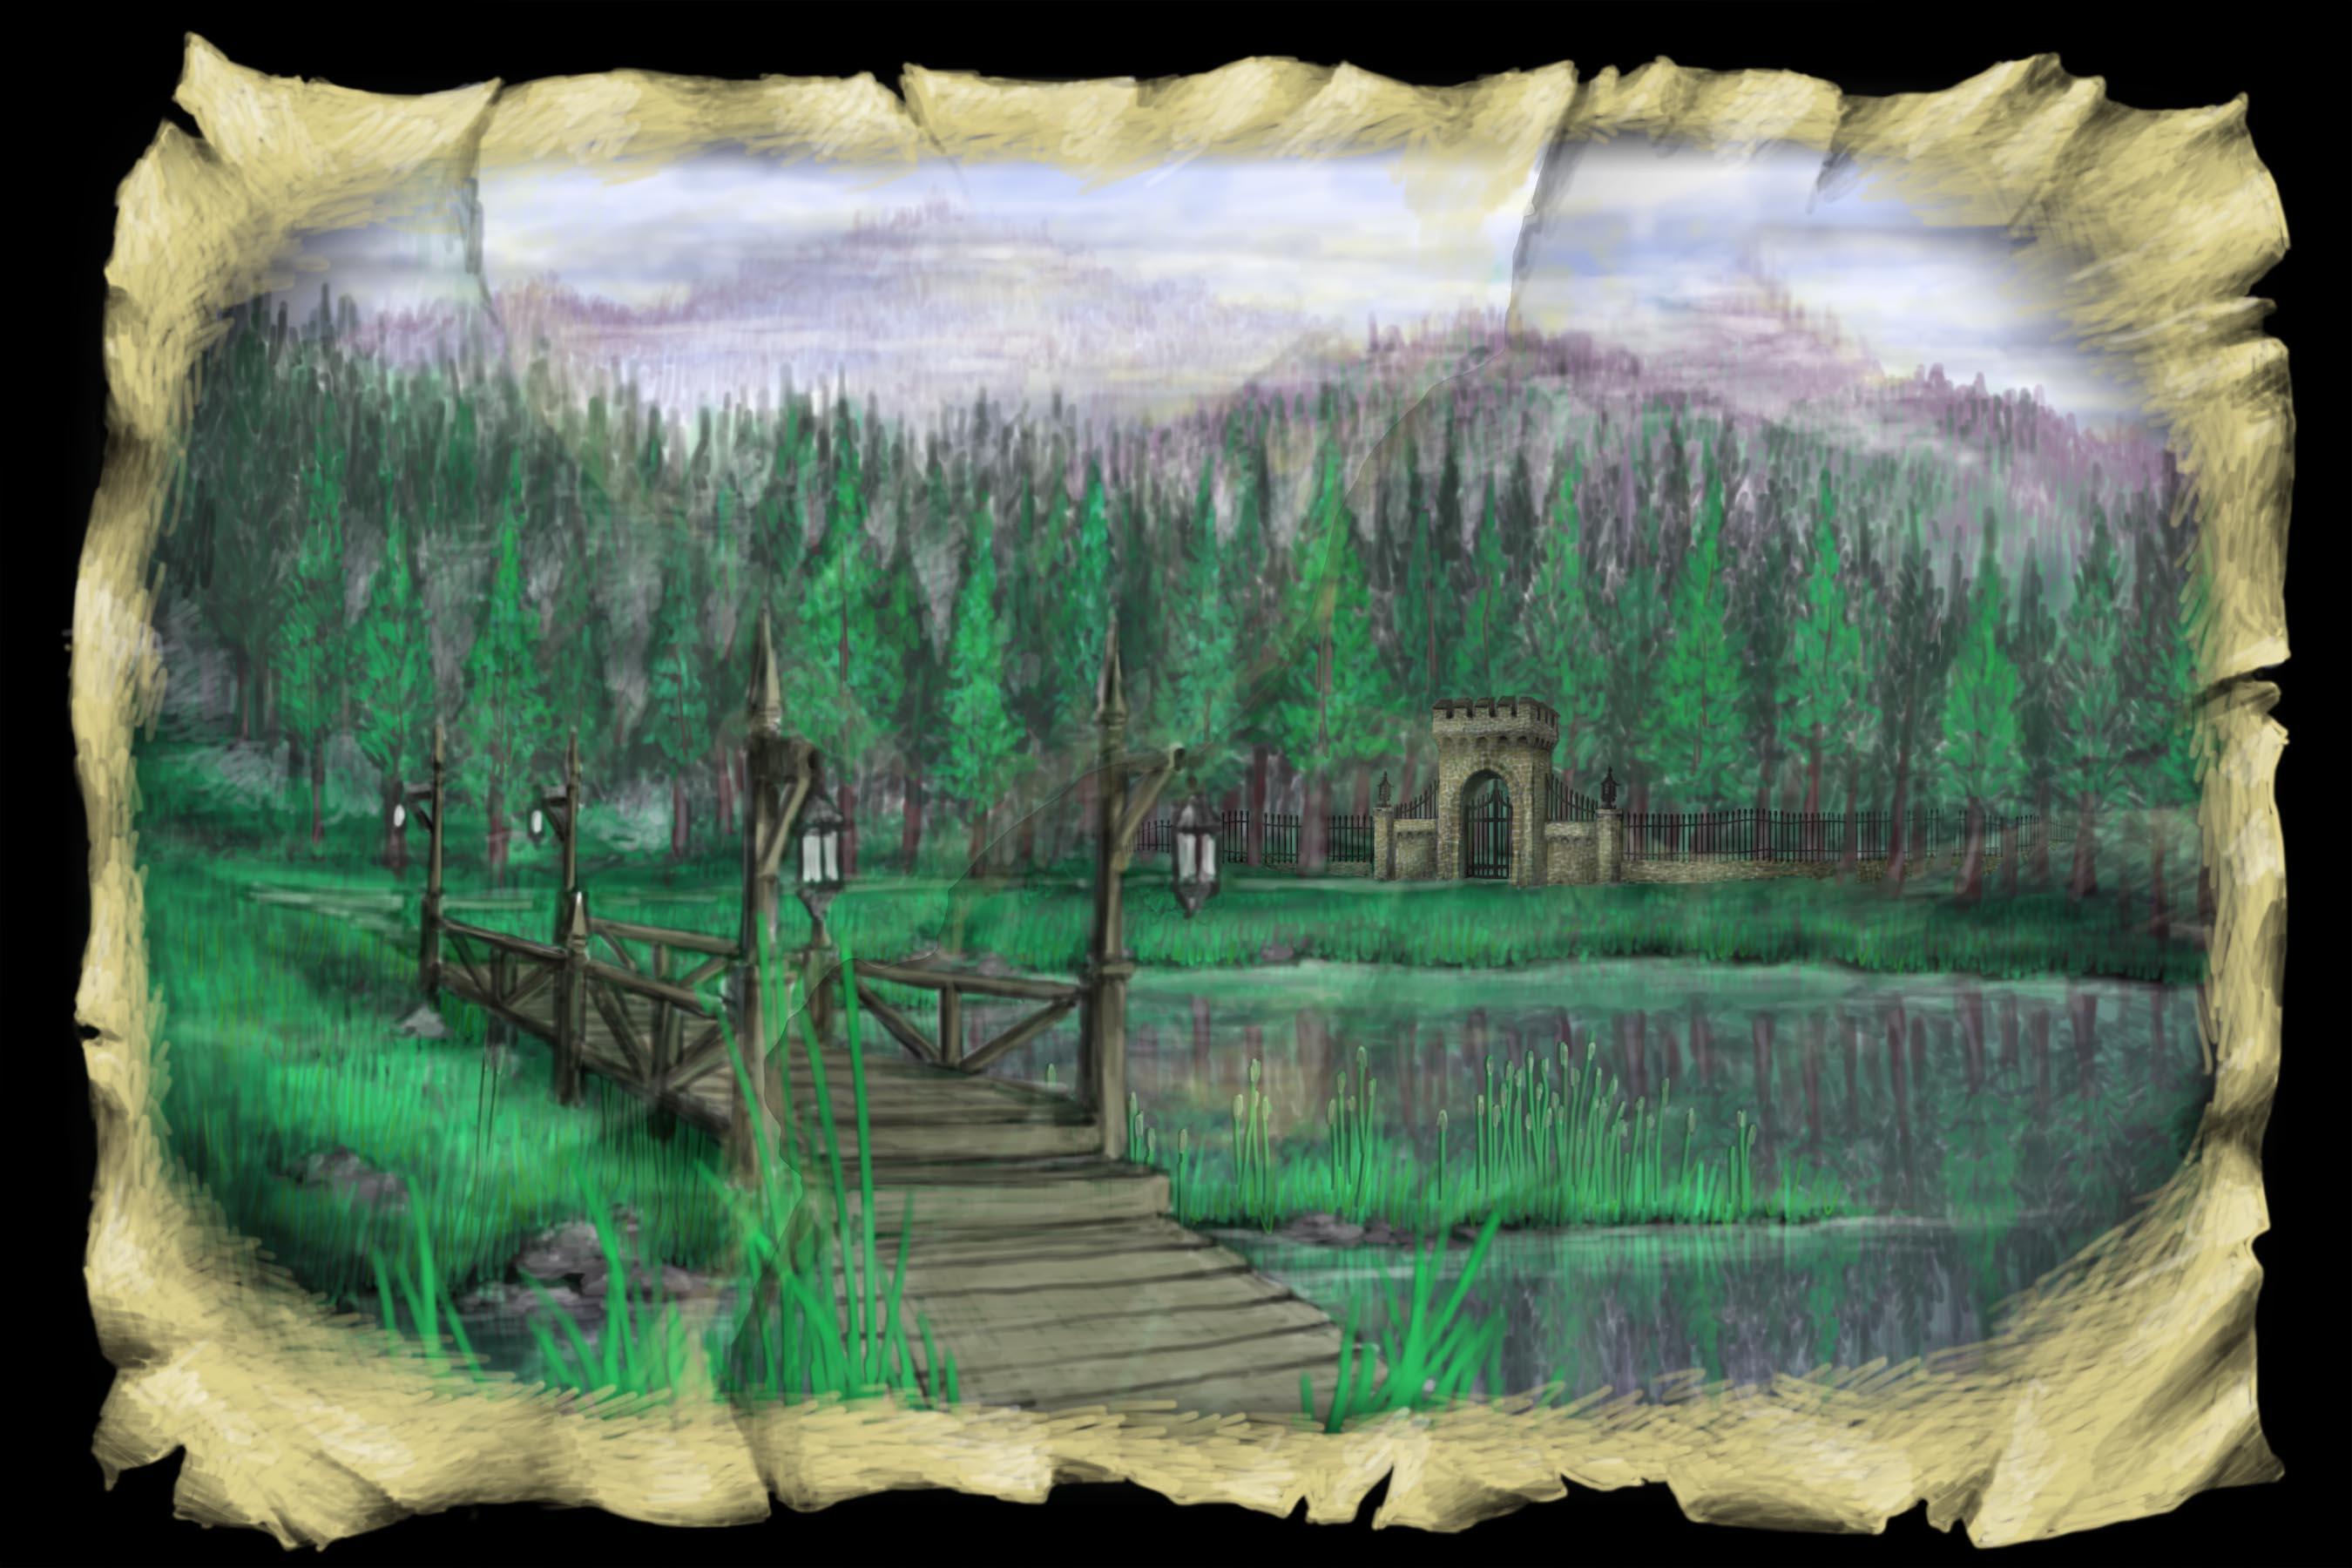 Scene 2i. Lake and Bridge, Restored